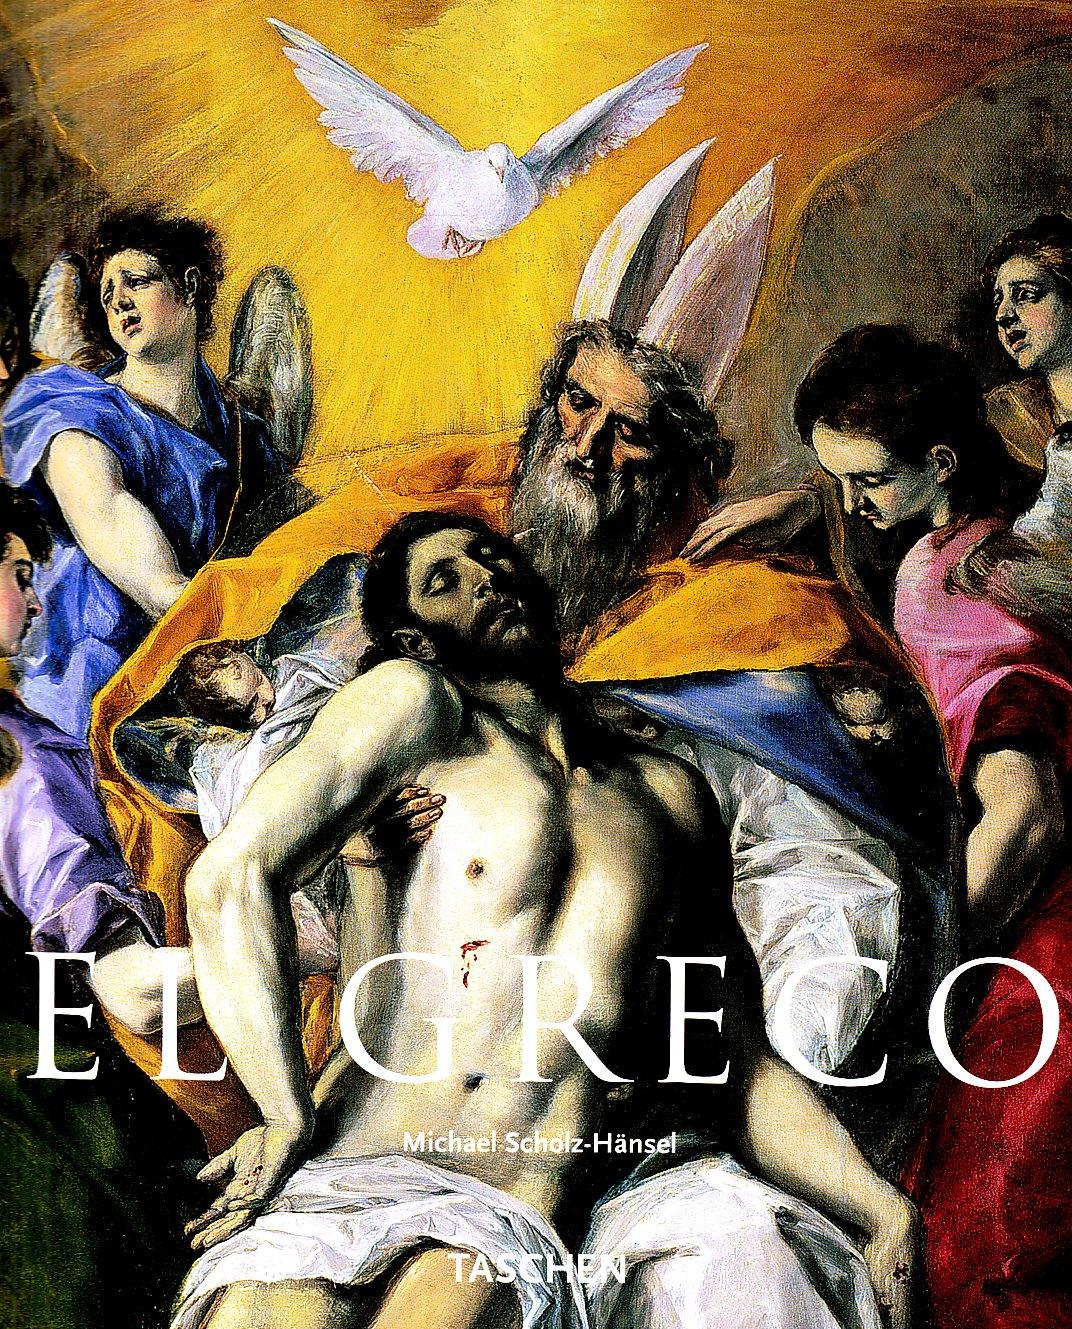 El Greco. Ediz. italiana Copertina flessibile – 27 apr 2005 Michael Scholz-Hänsel Taschen 3822839221 ART / European